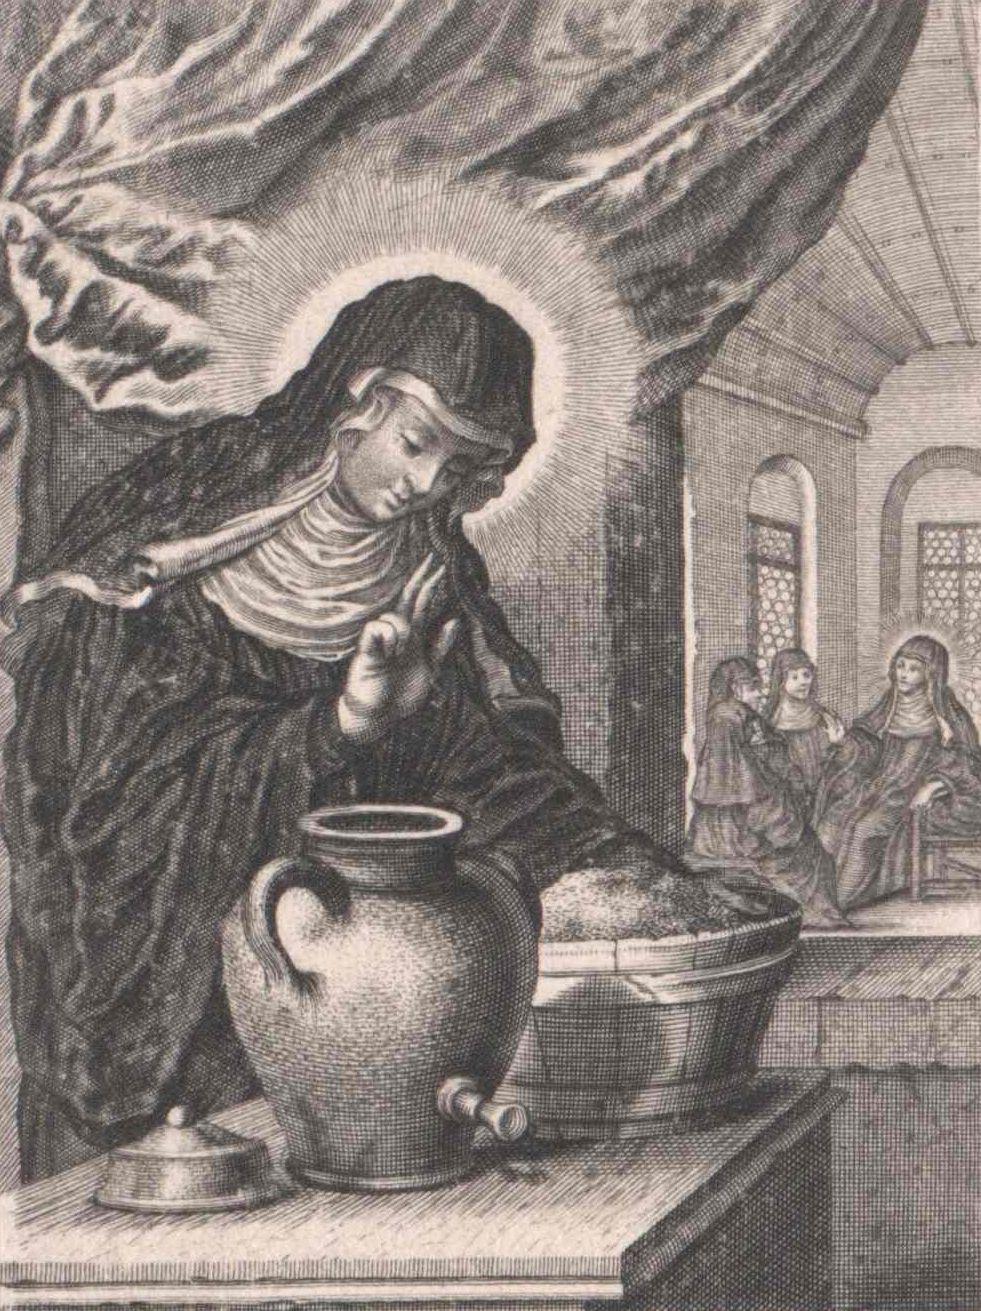 Saint Monegundis